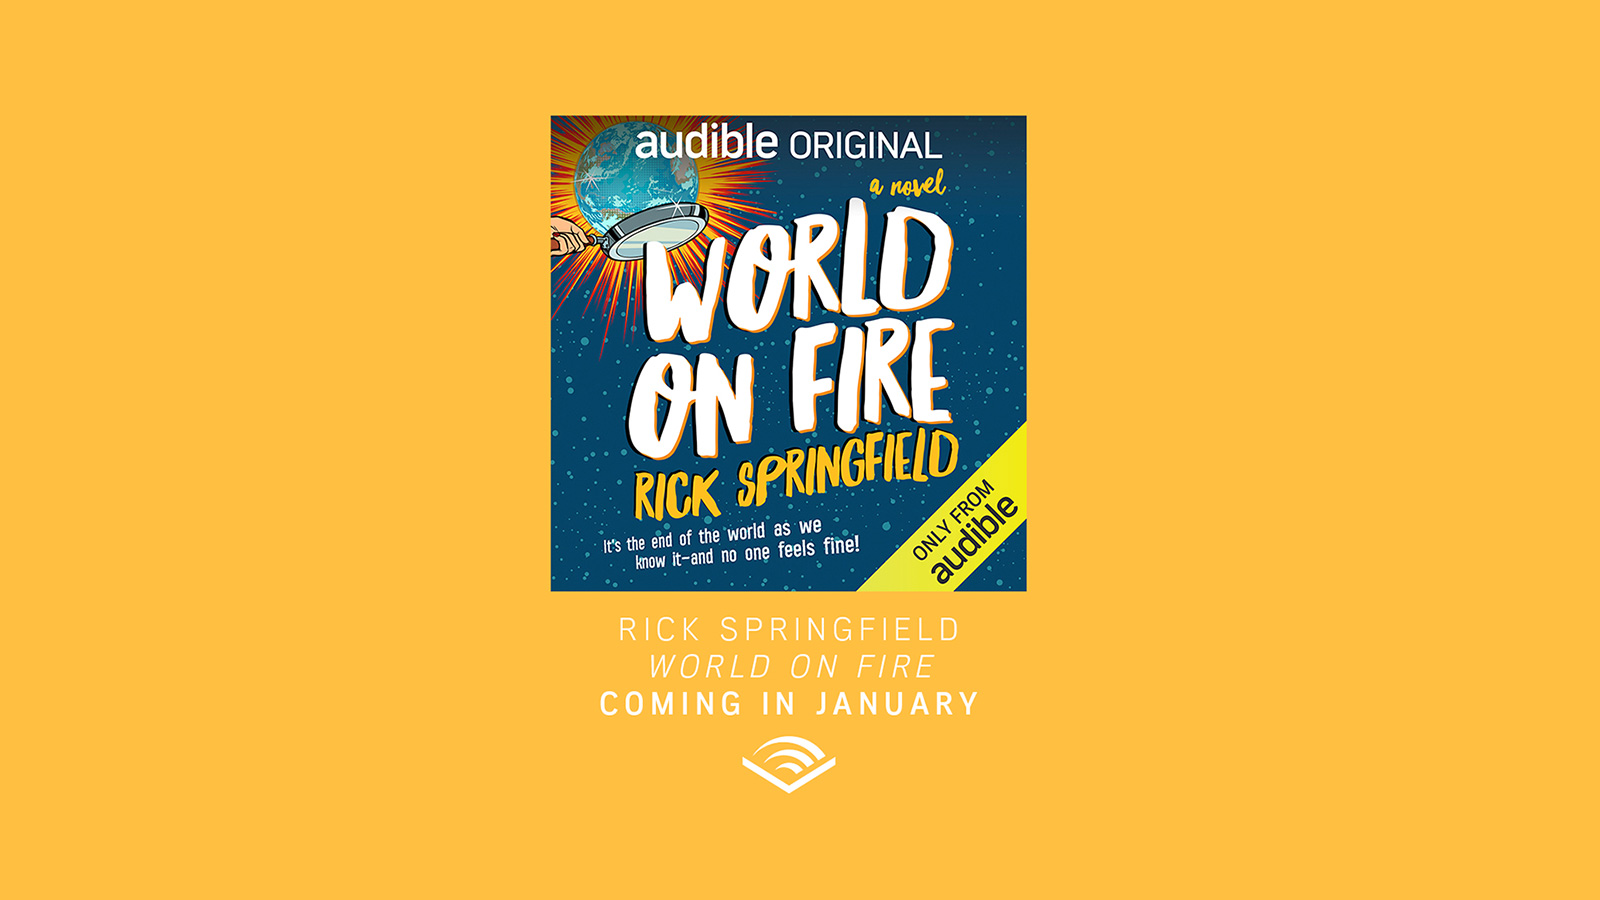 World on Fire - Rick Springfield